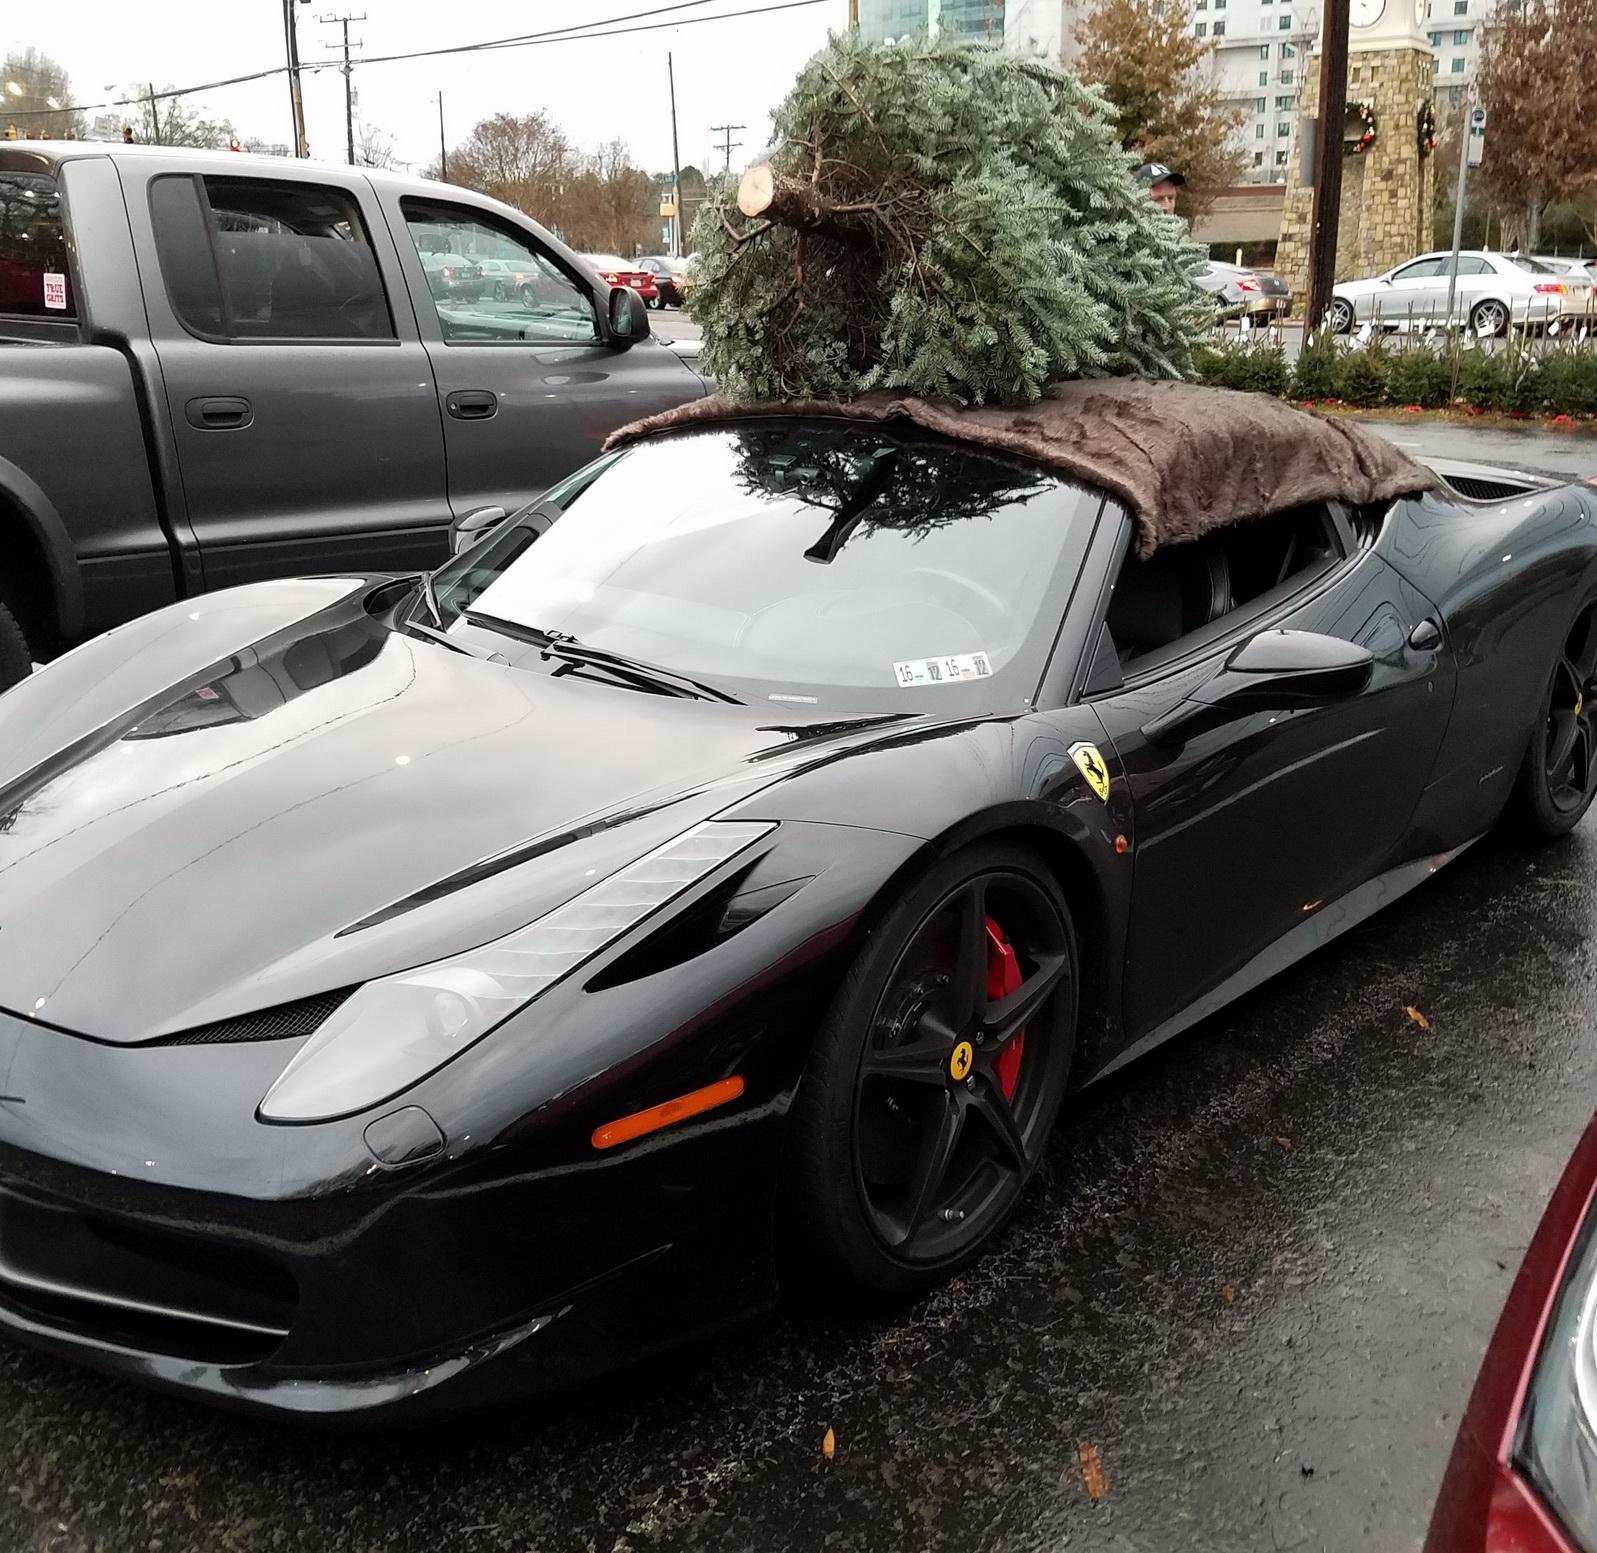 Transport Ferrari: How To Transport A Christmas Tree? Why, A Ferrari 458 Will